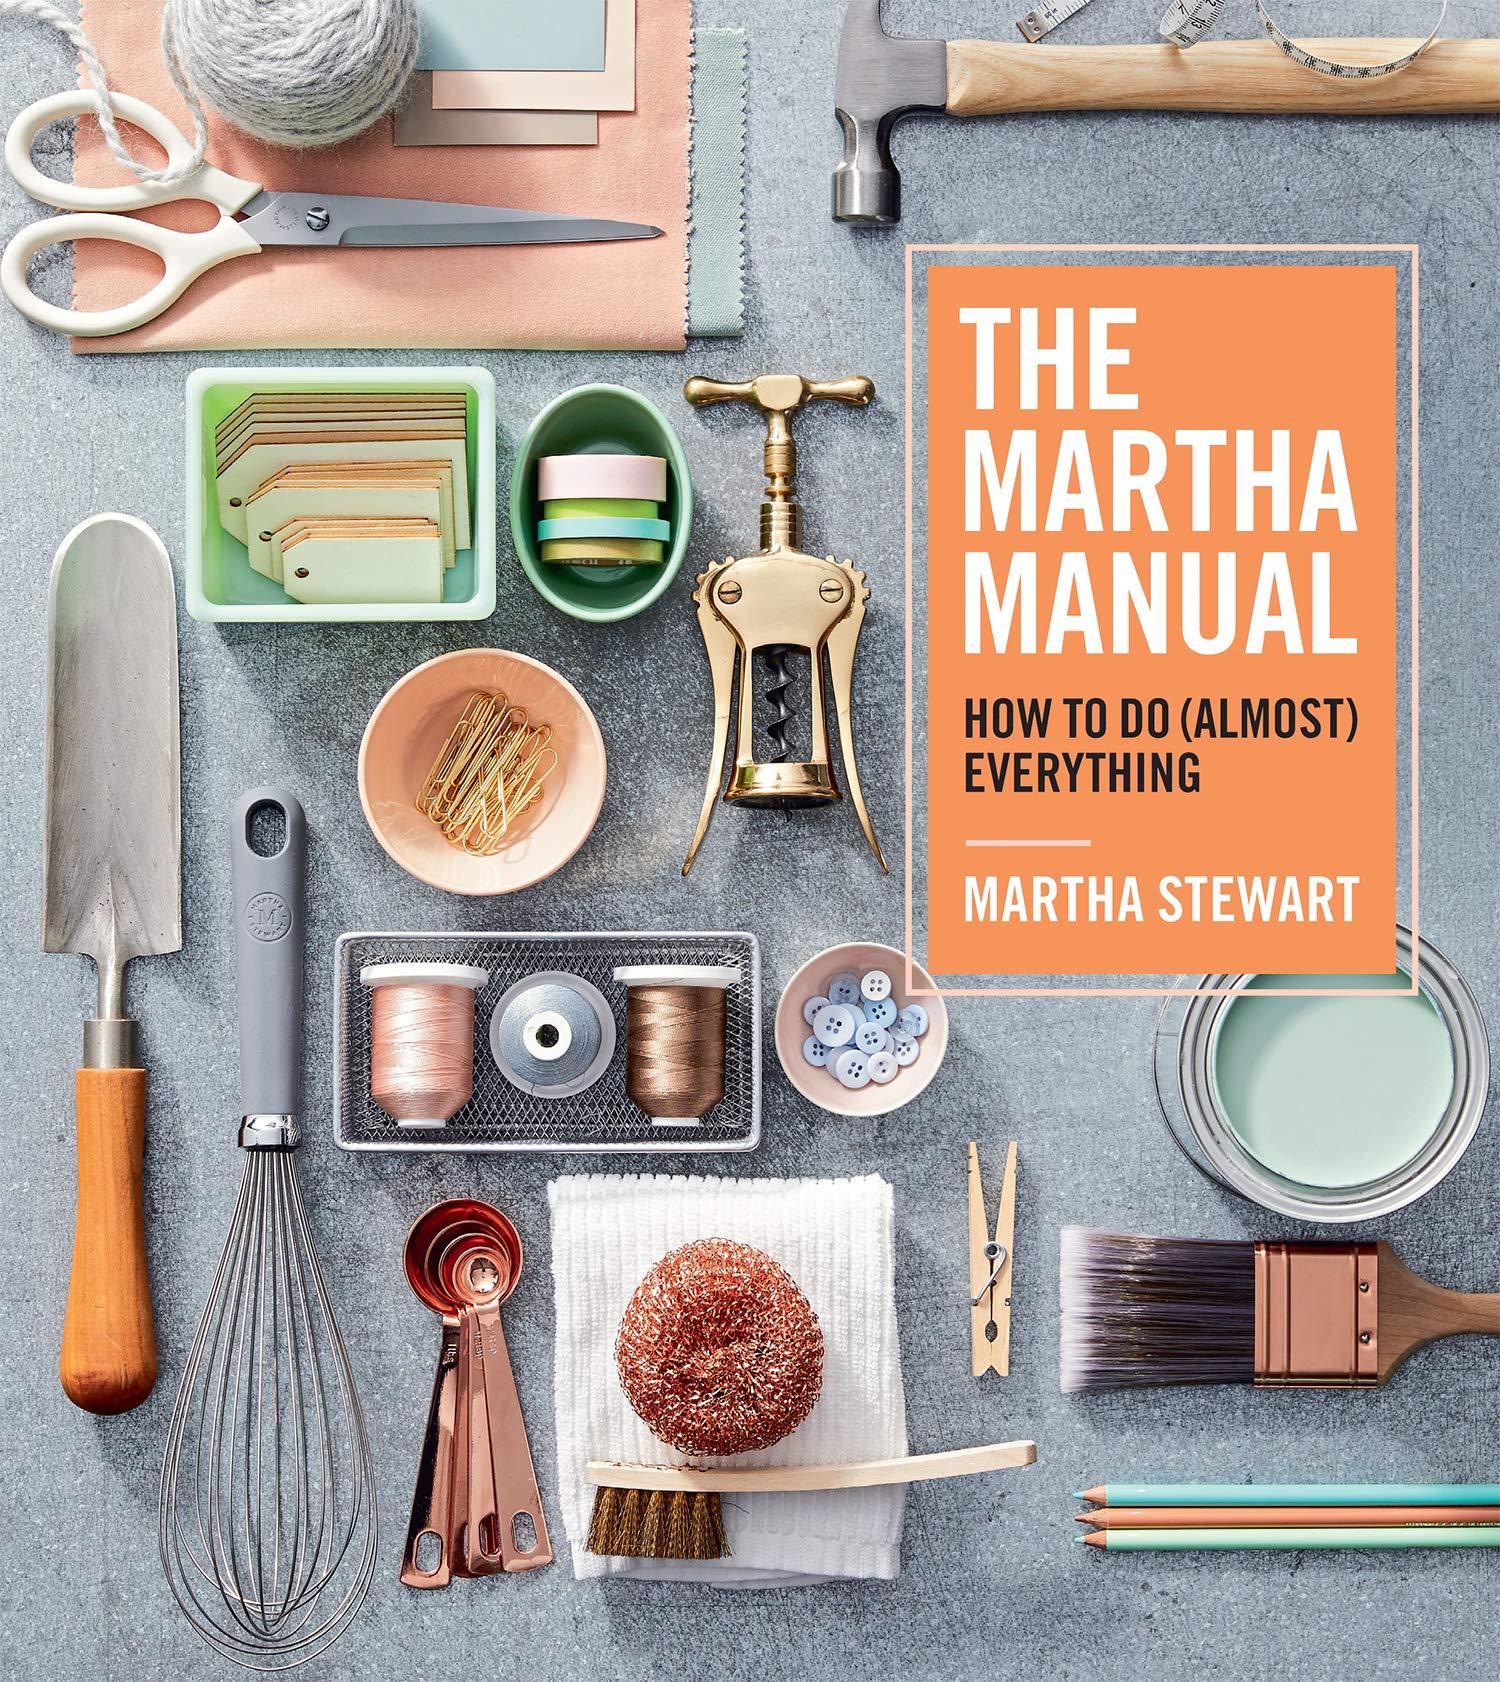 Martha Manual